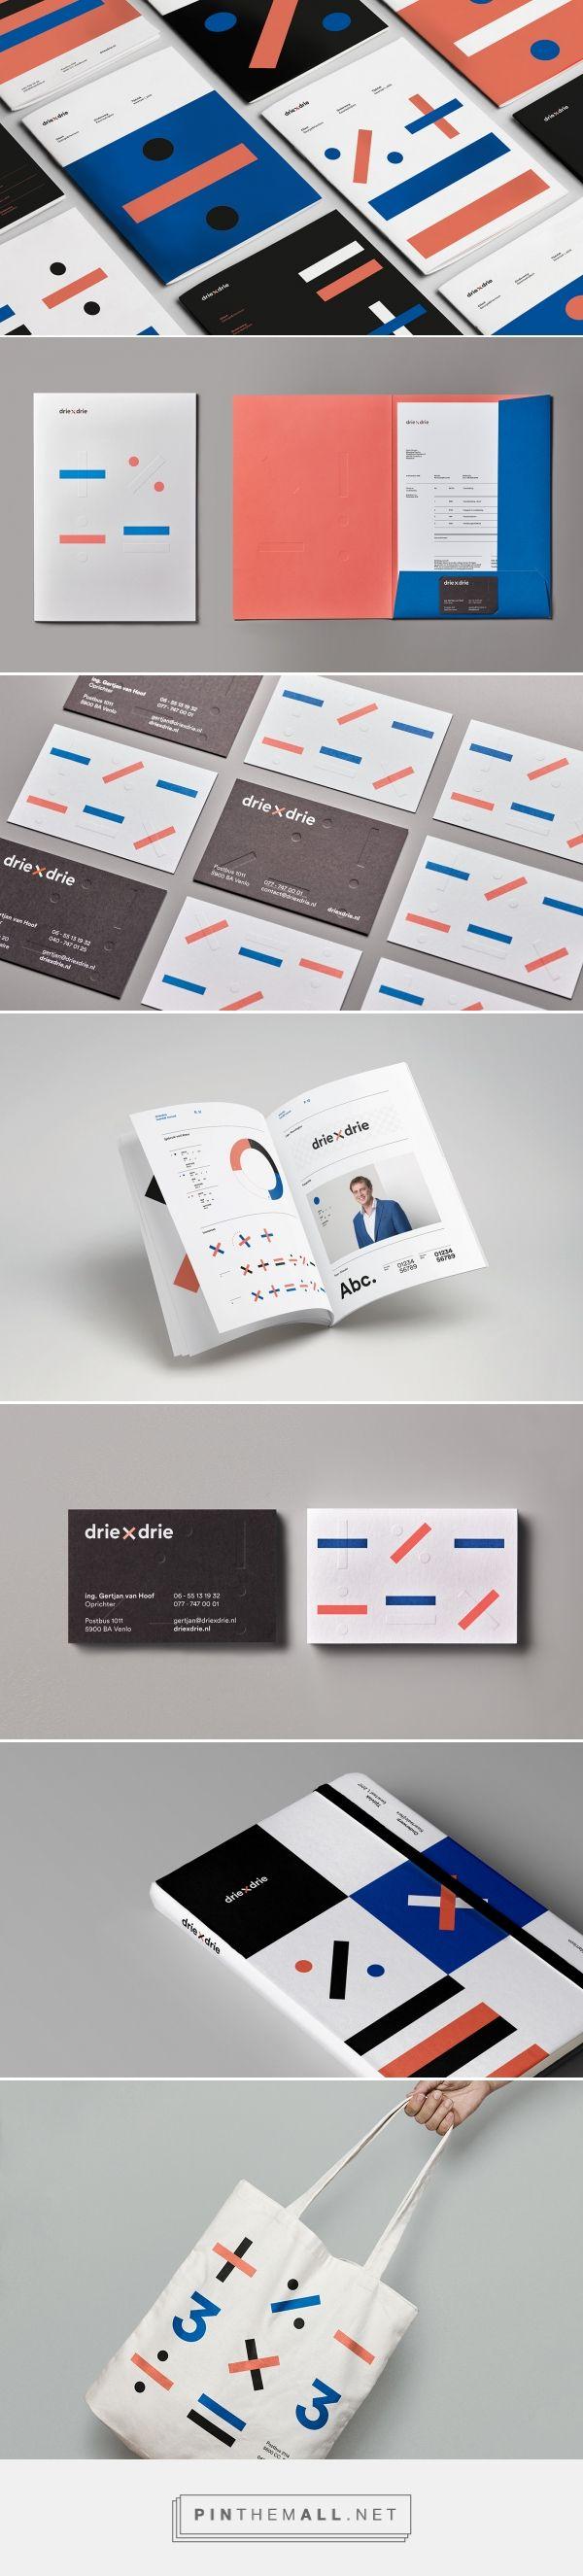 driexdrie - branding | Abduzeedo Design Inspiration - created via https://pinthemall.net